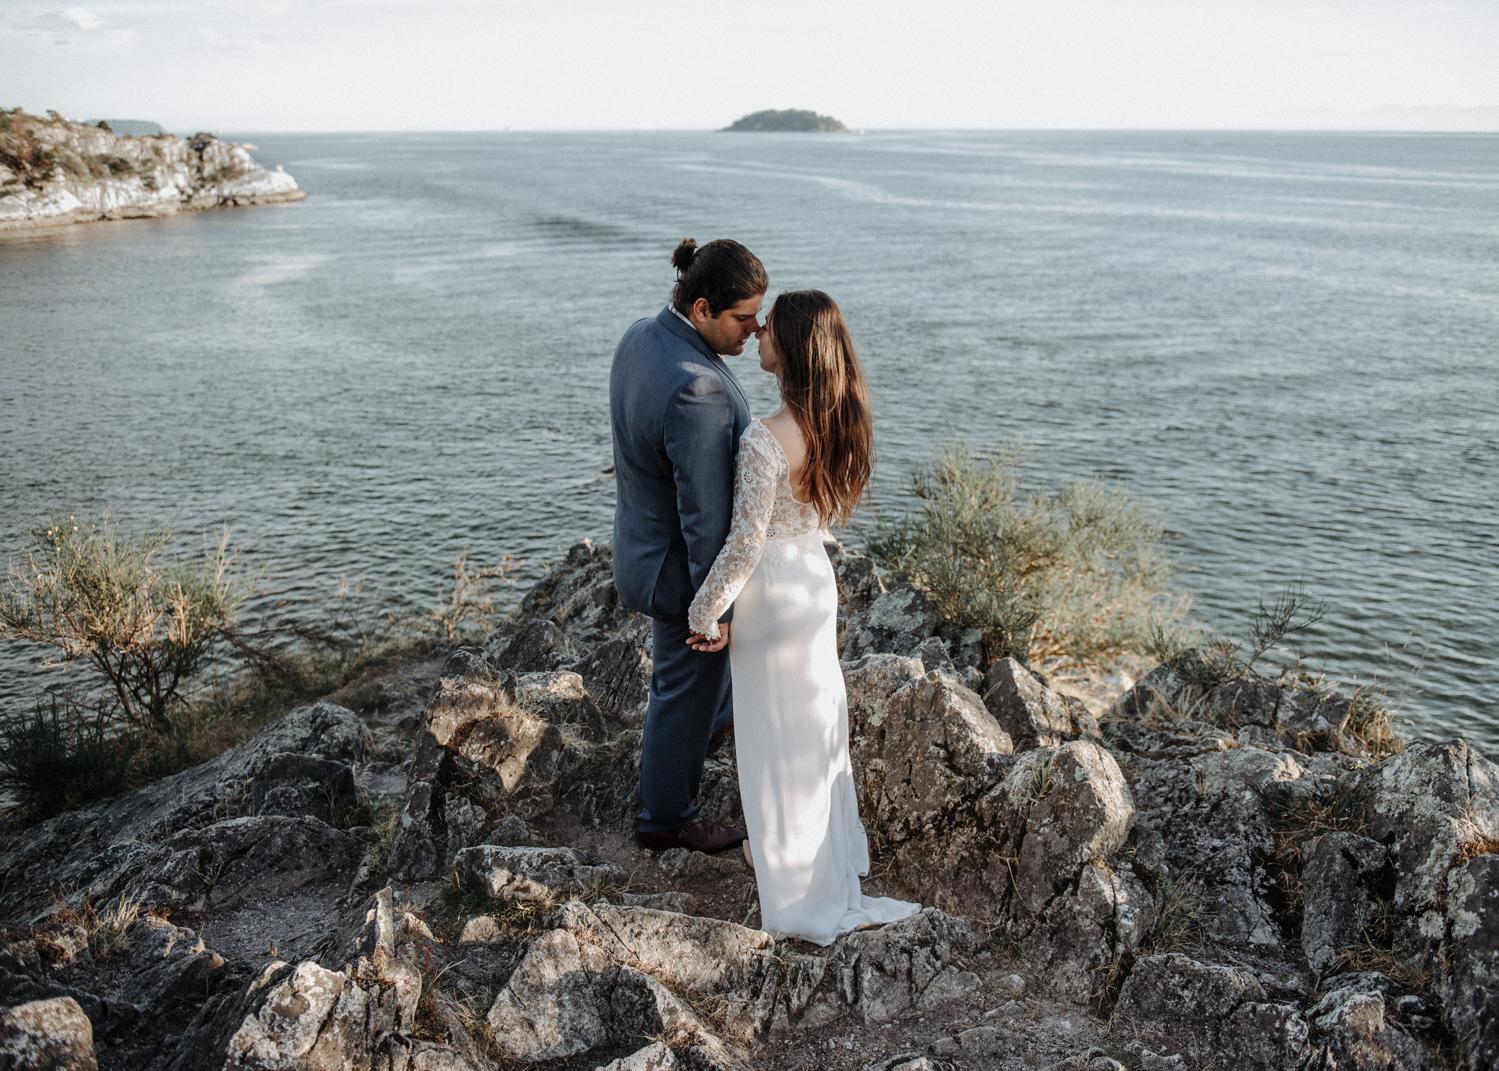 kaoverii_silva_photographer_lison_iman_wedding_websize-302.jpg